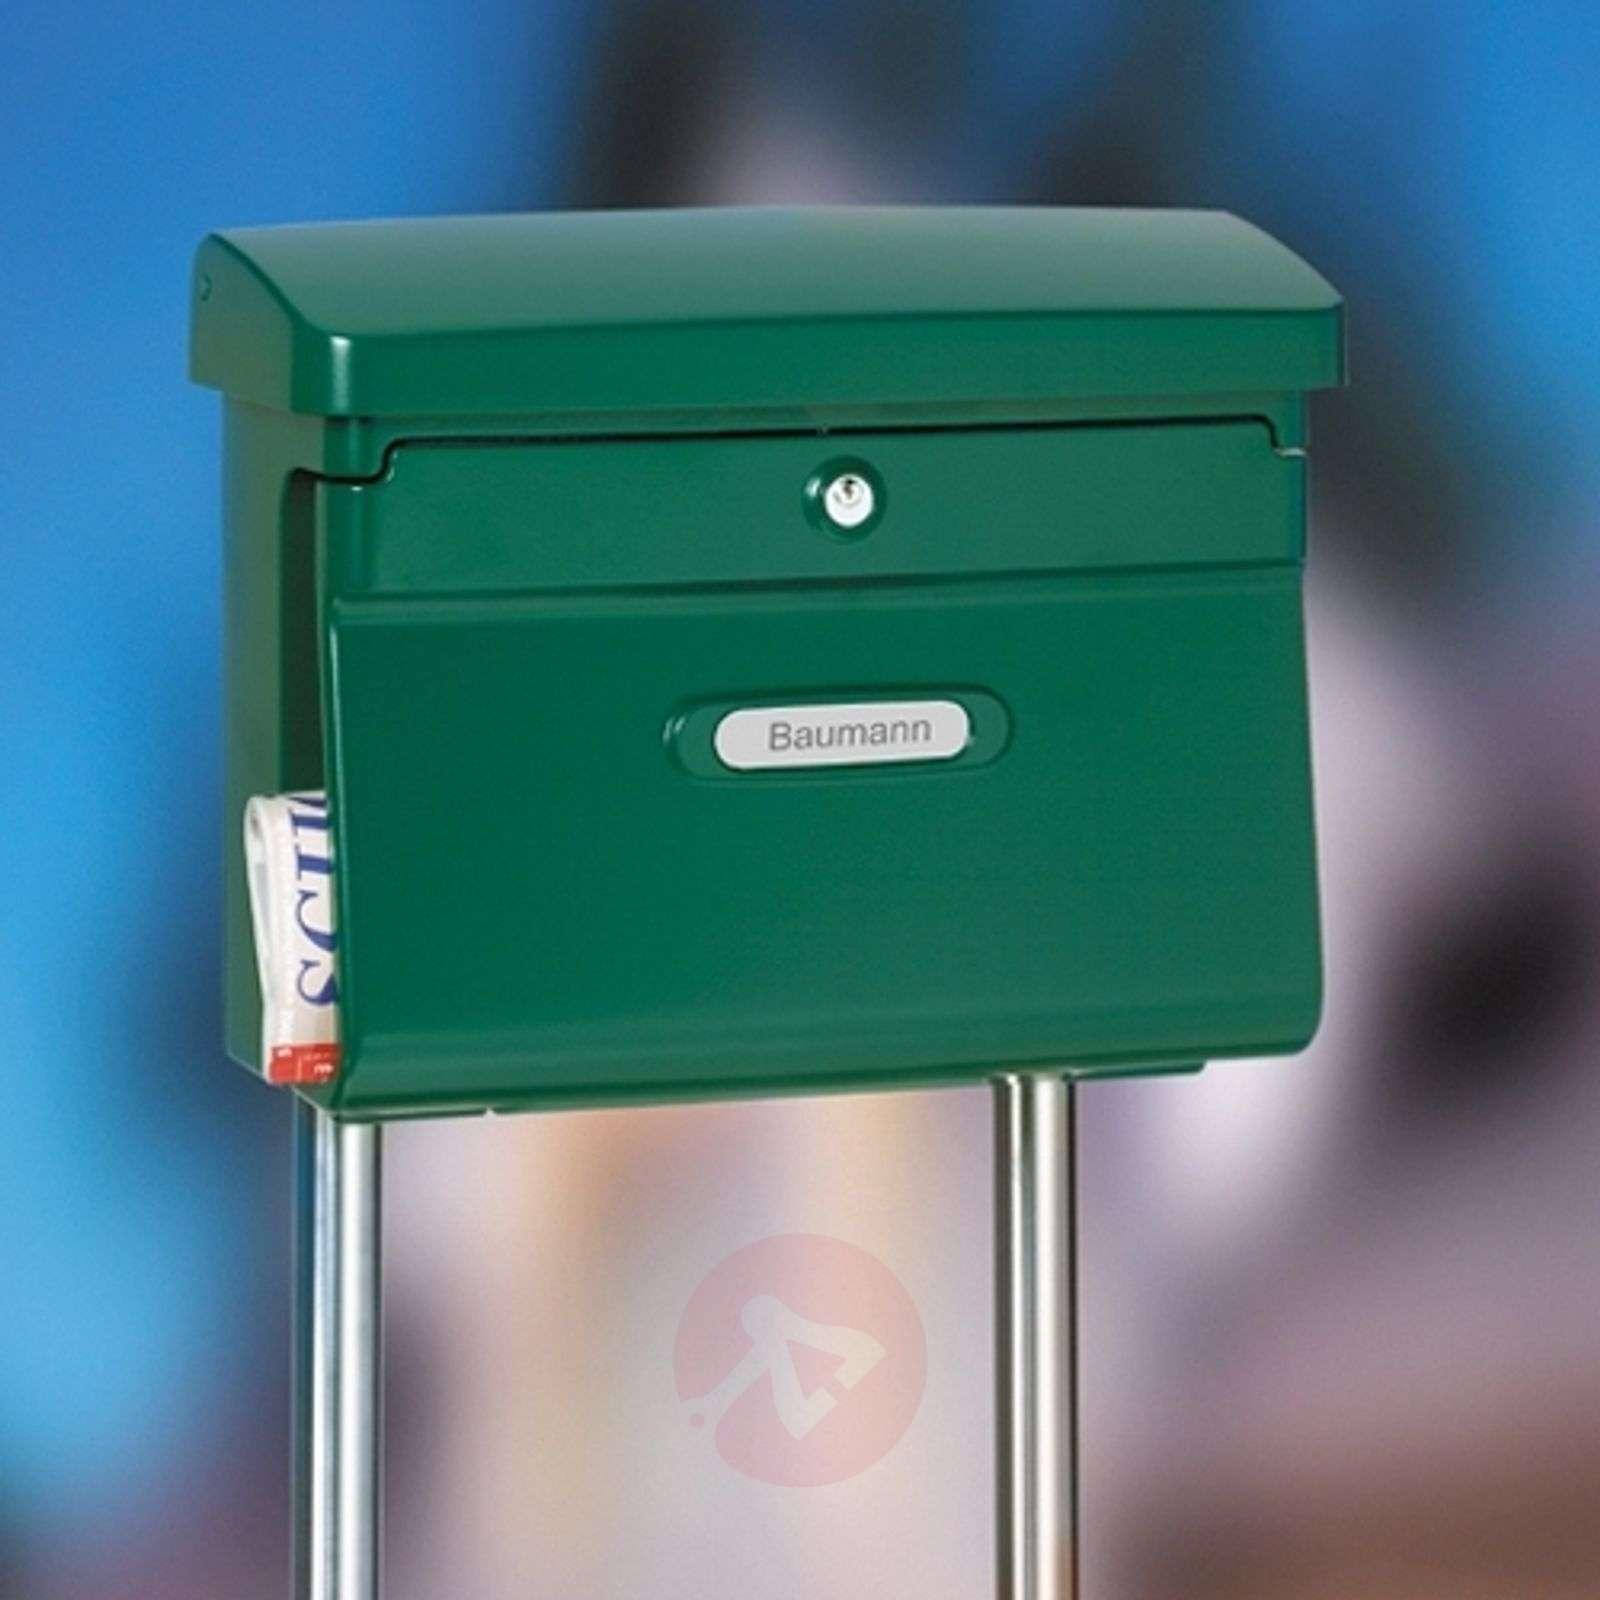 Universal 150-postilaatikkopylväs, teräs-1532121-01